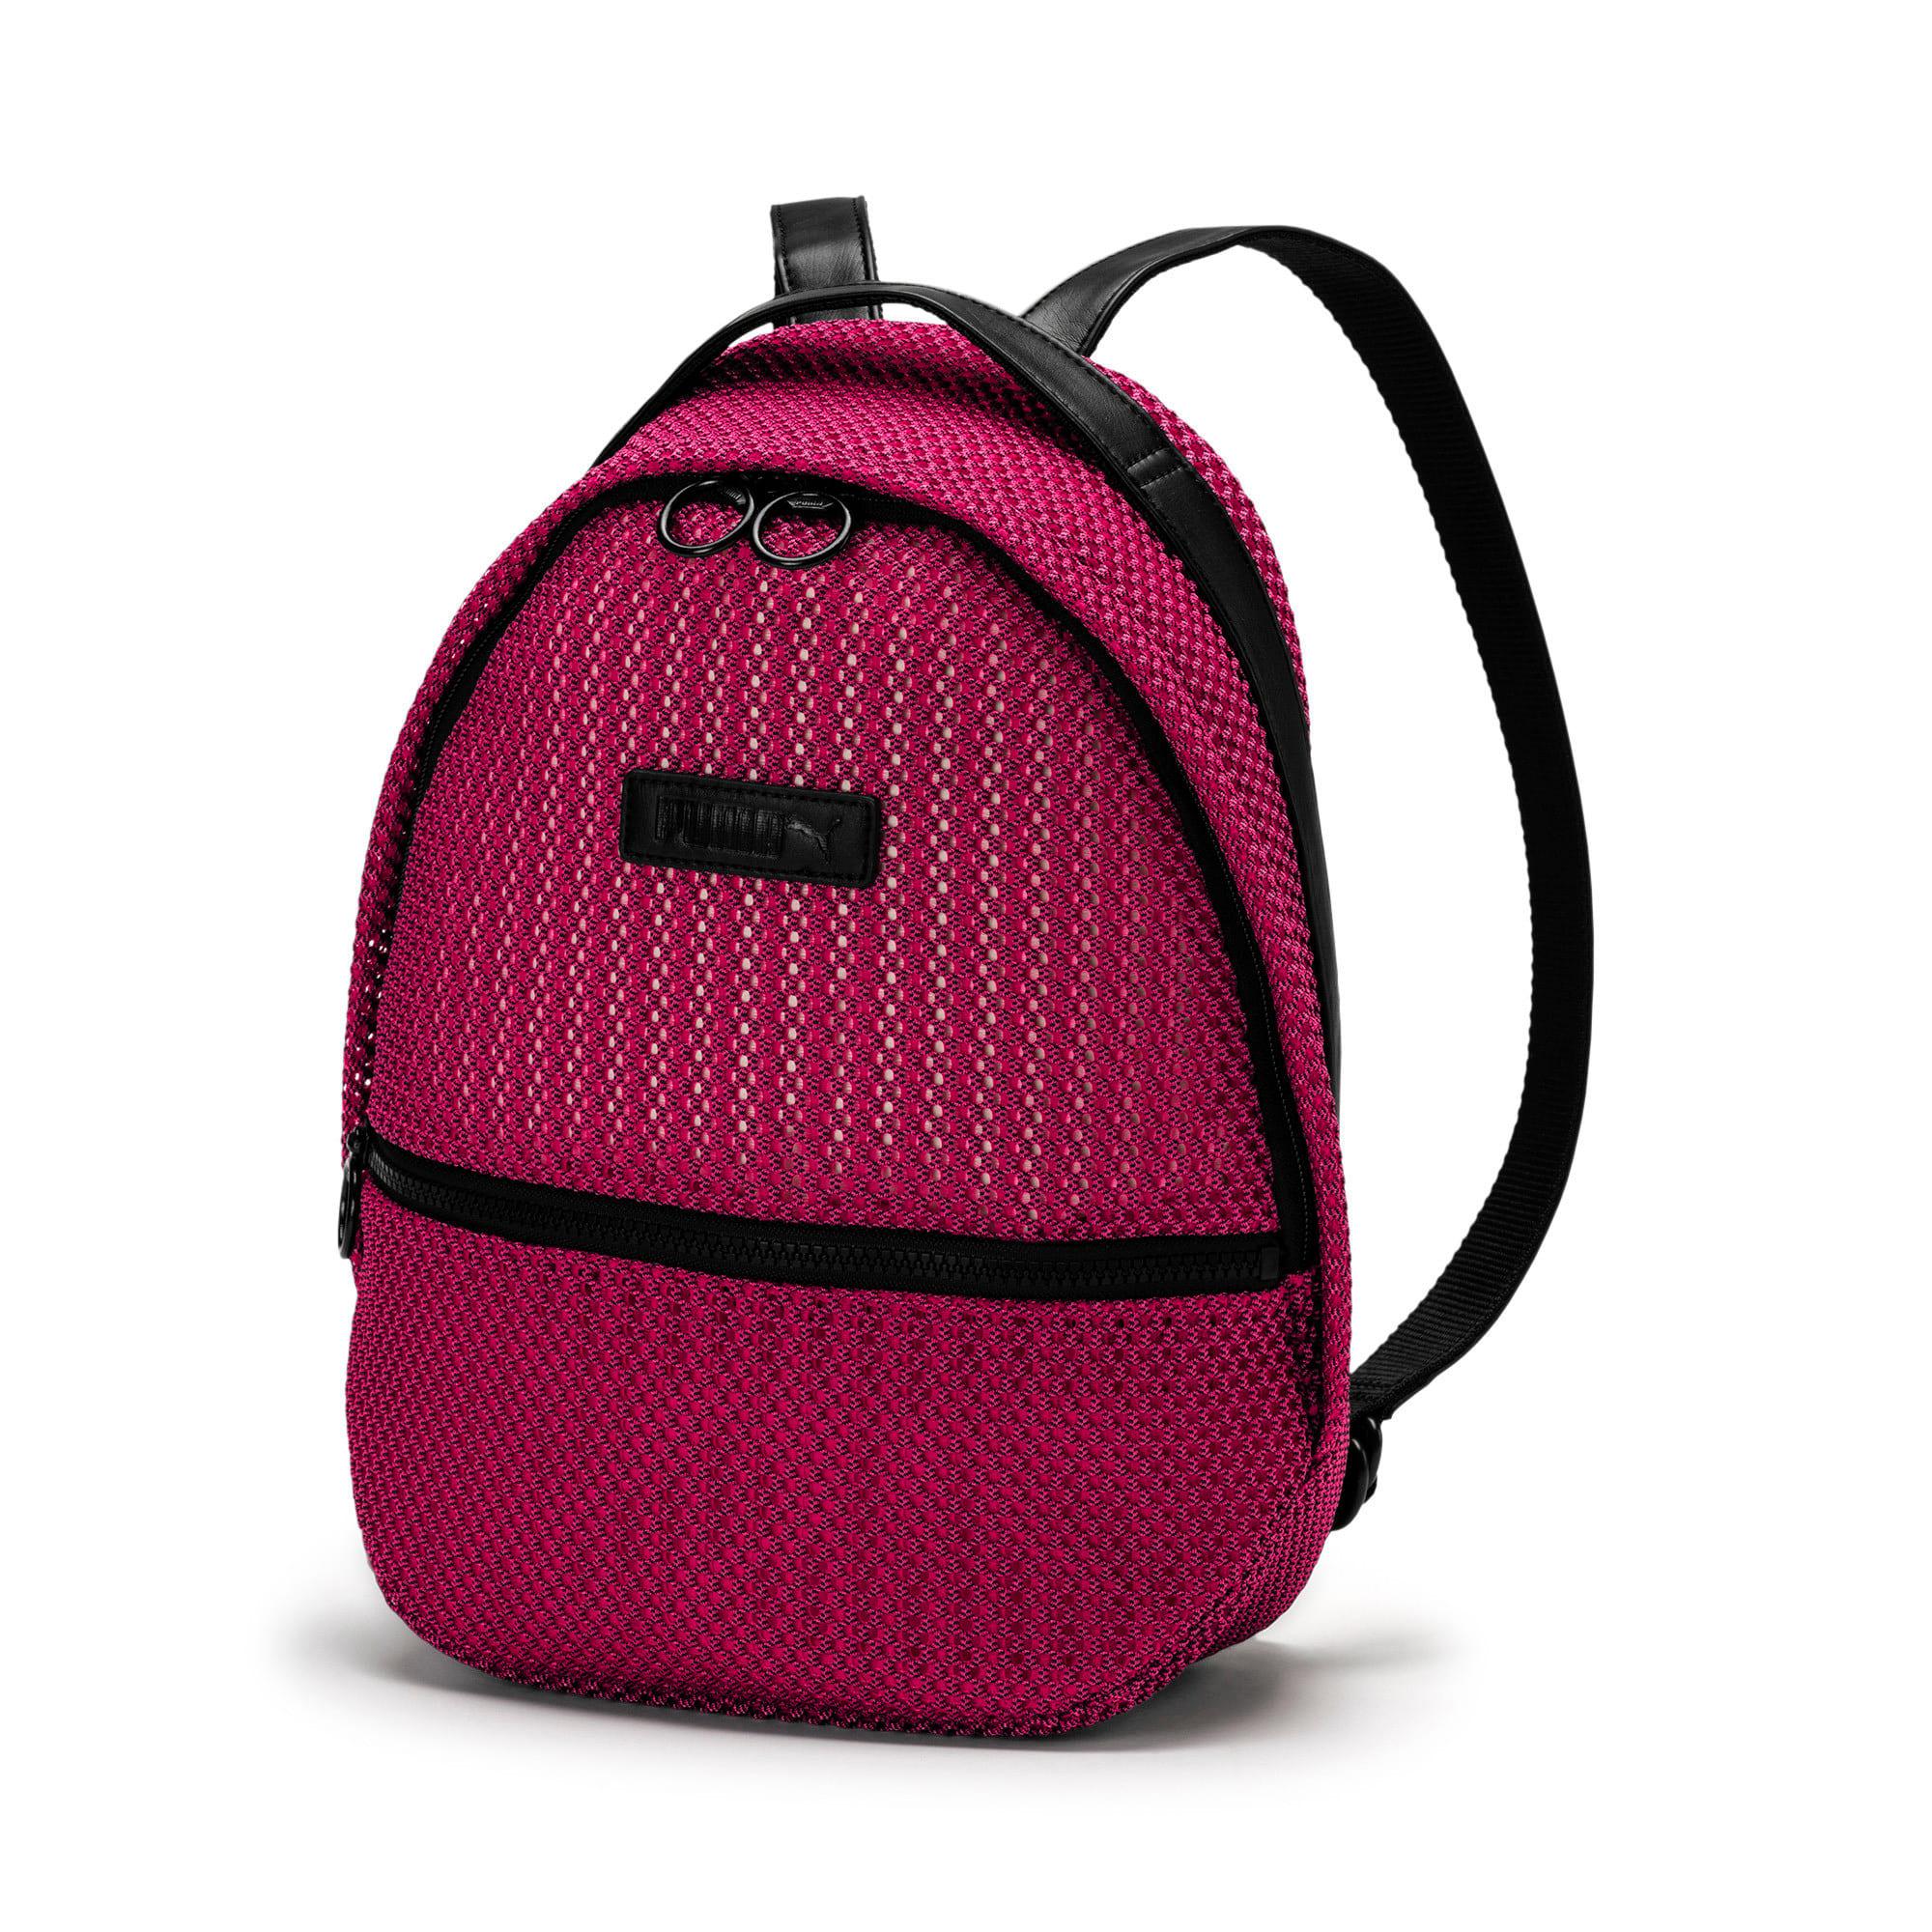 Thumbnail 1 of Prime Time Archive Festival Backpack, Fuchsia Purple-Puma Black, medium